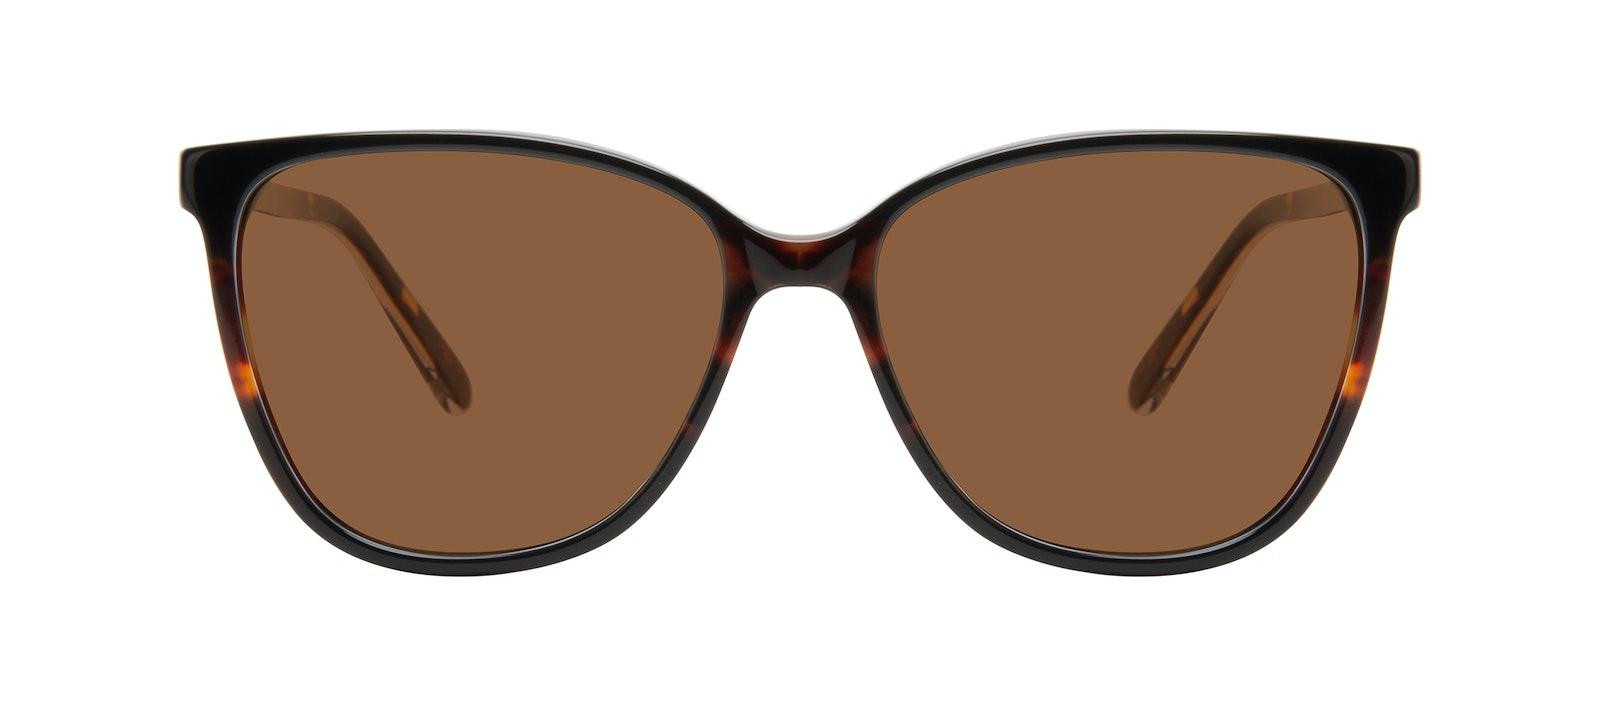 Affordable Fashion Glasses Square Sunglasses Women Flora Tundra Front